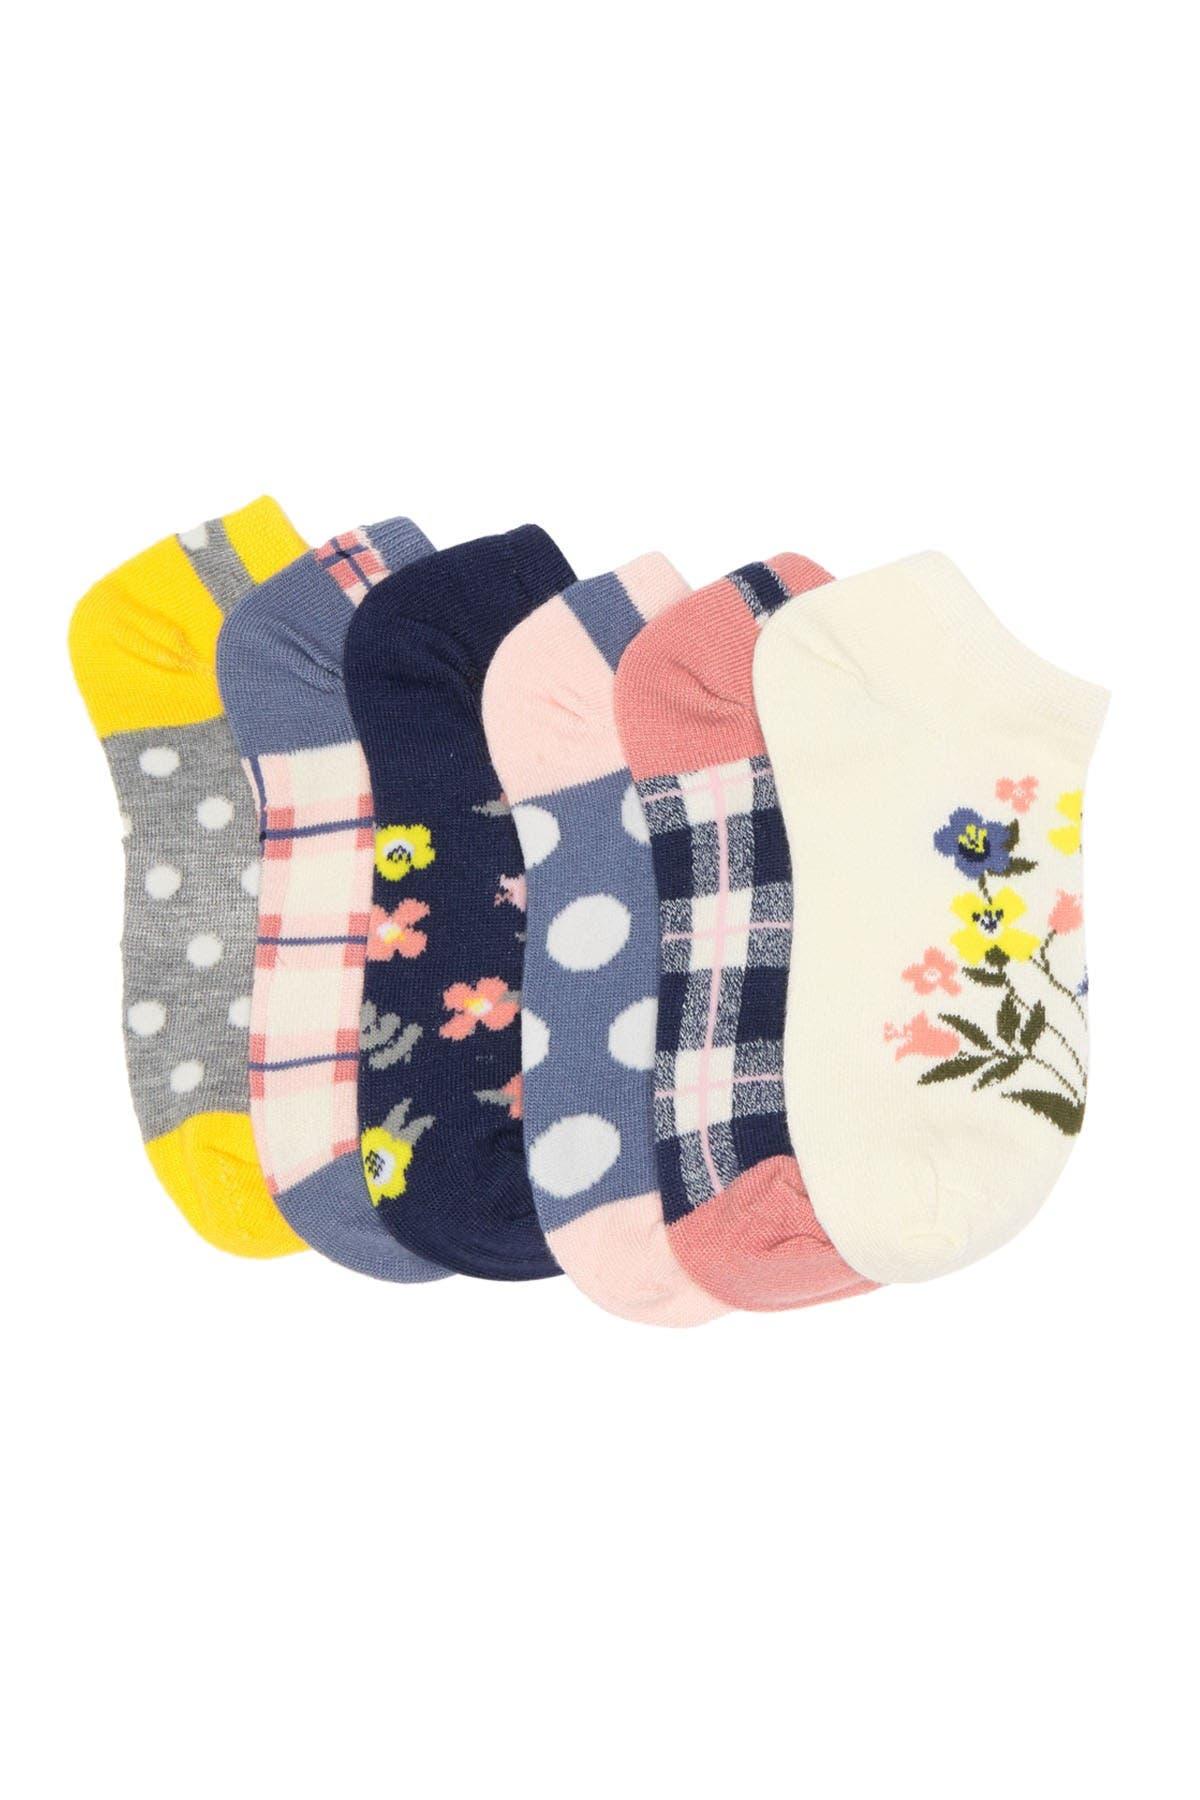 Image of Harper Canyon Printed Low Cut Socks - Pack of 6